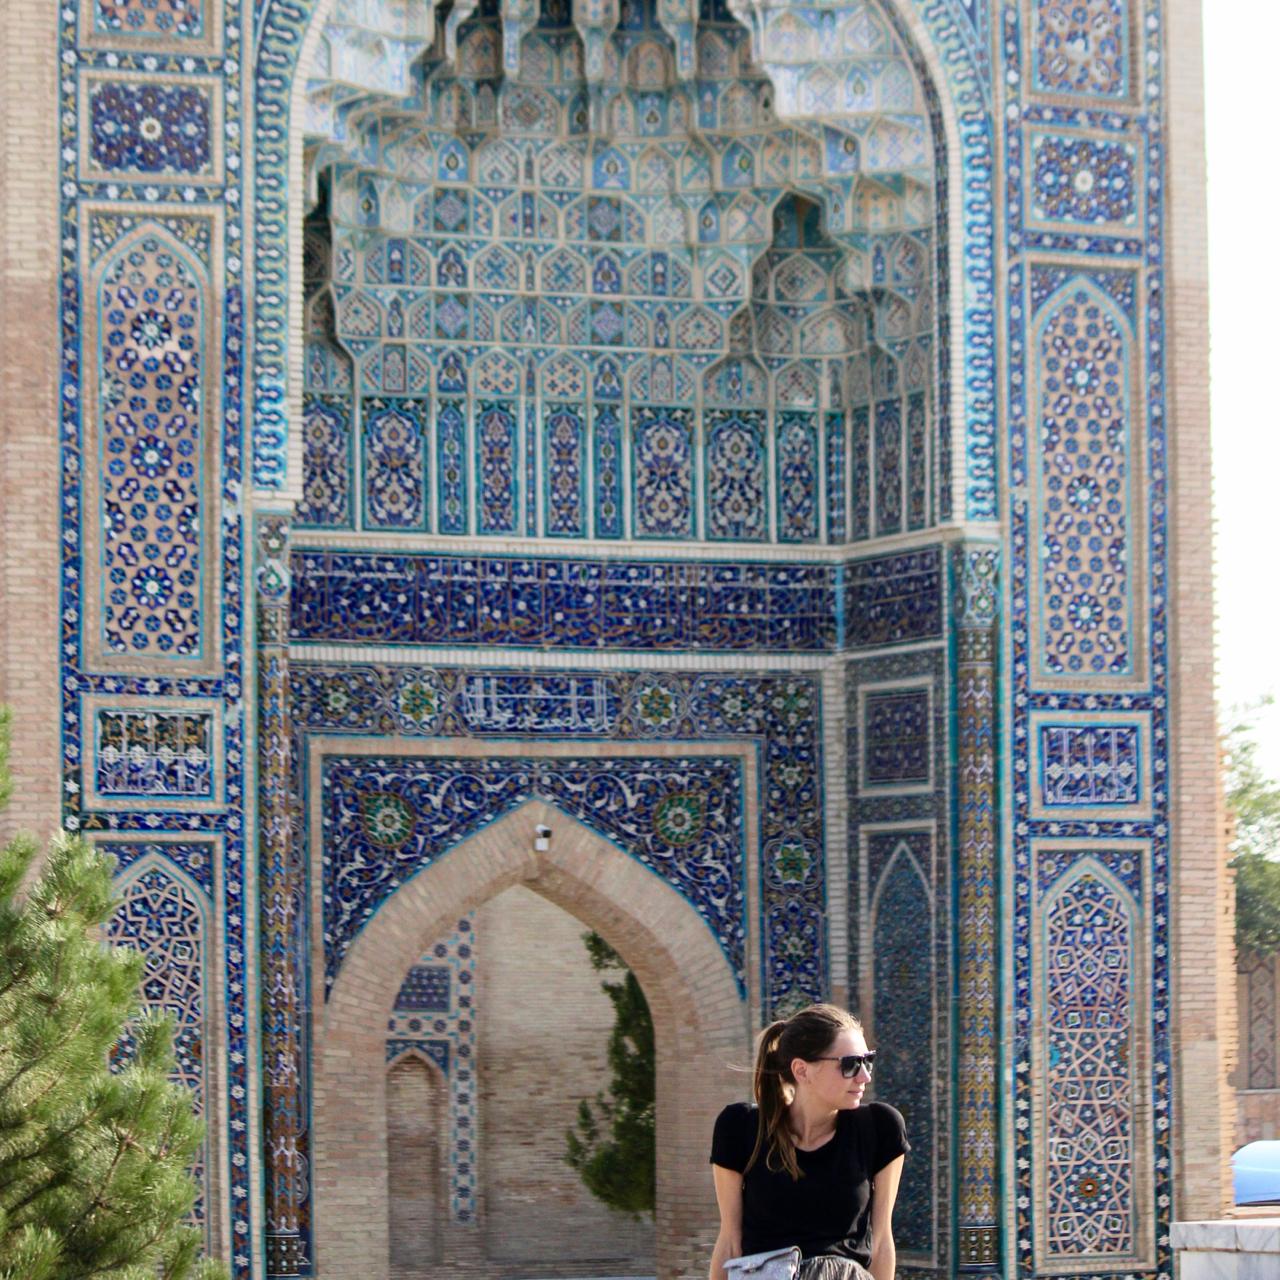 samarkand, uzbekistan - 15